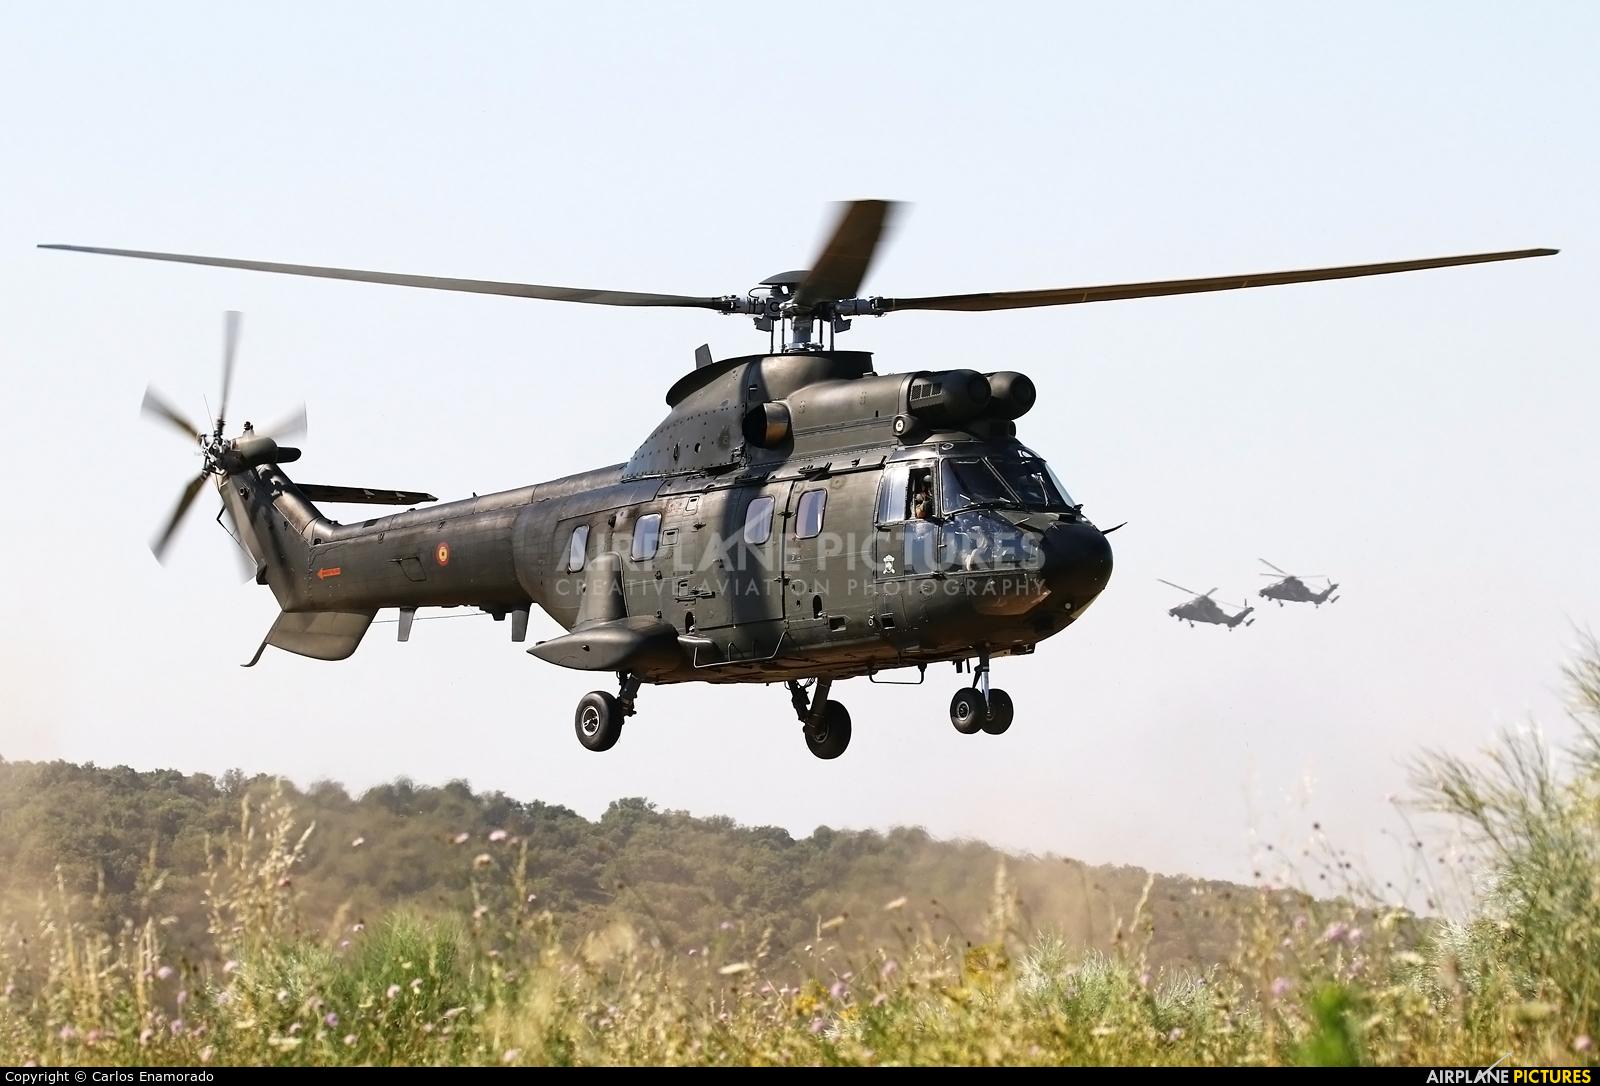 Spain - Army HU.21-08 / ET-502 aircraft at Colmenar Viejo